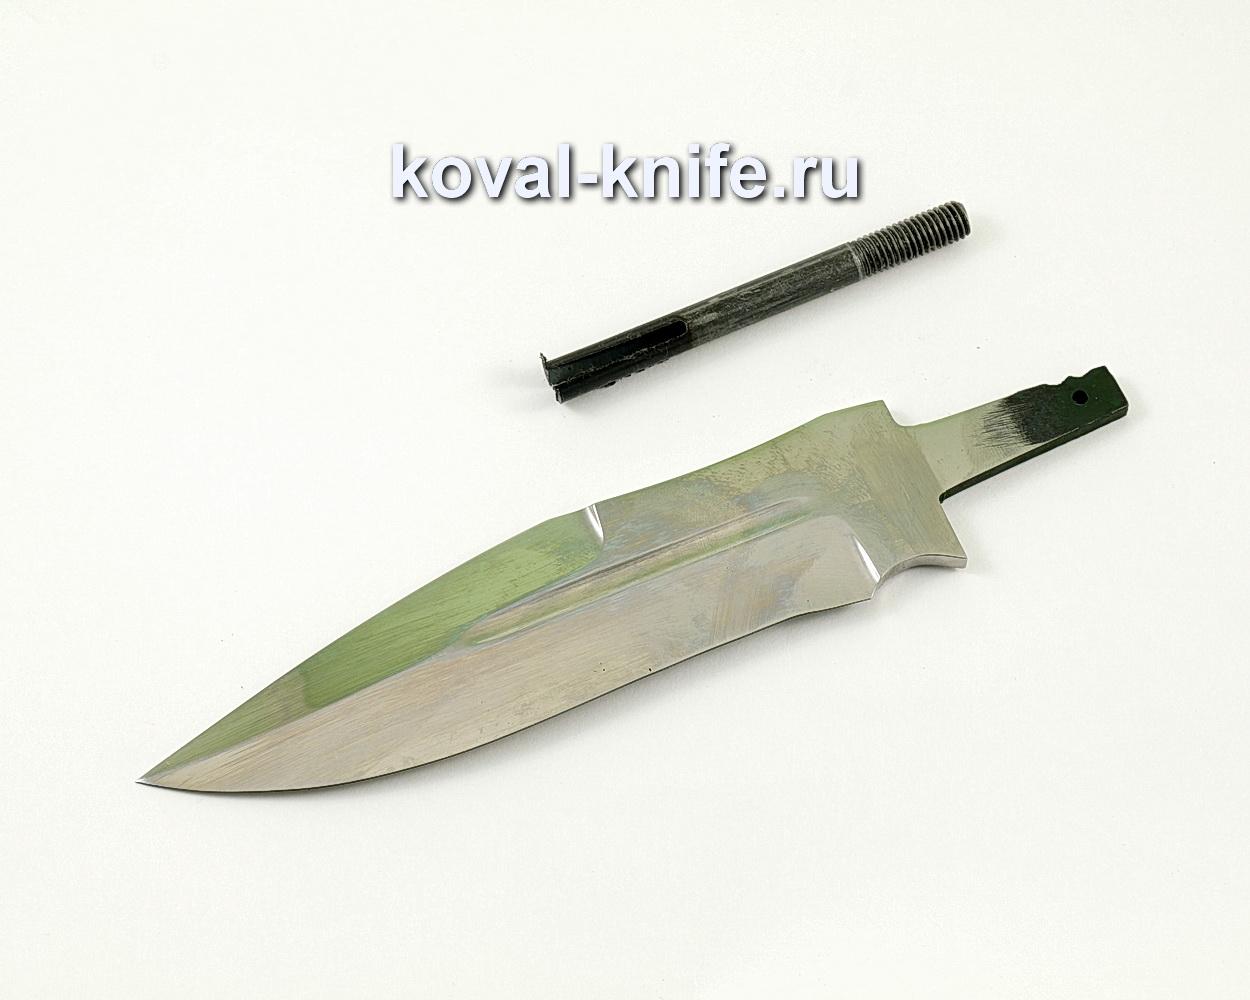 Клинок для ножа Антитеррор (кованая сталь 95Х18)